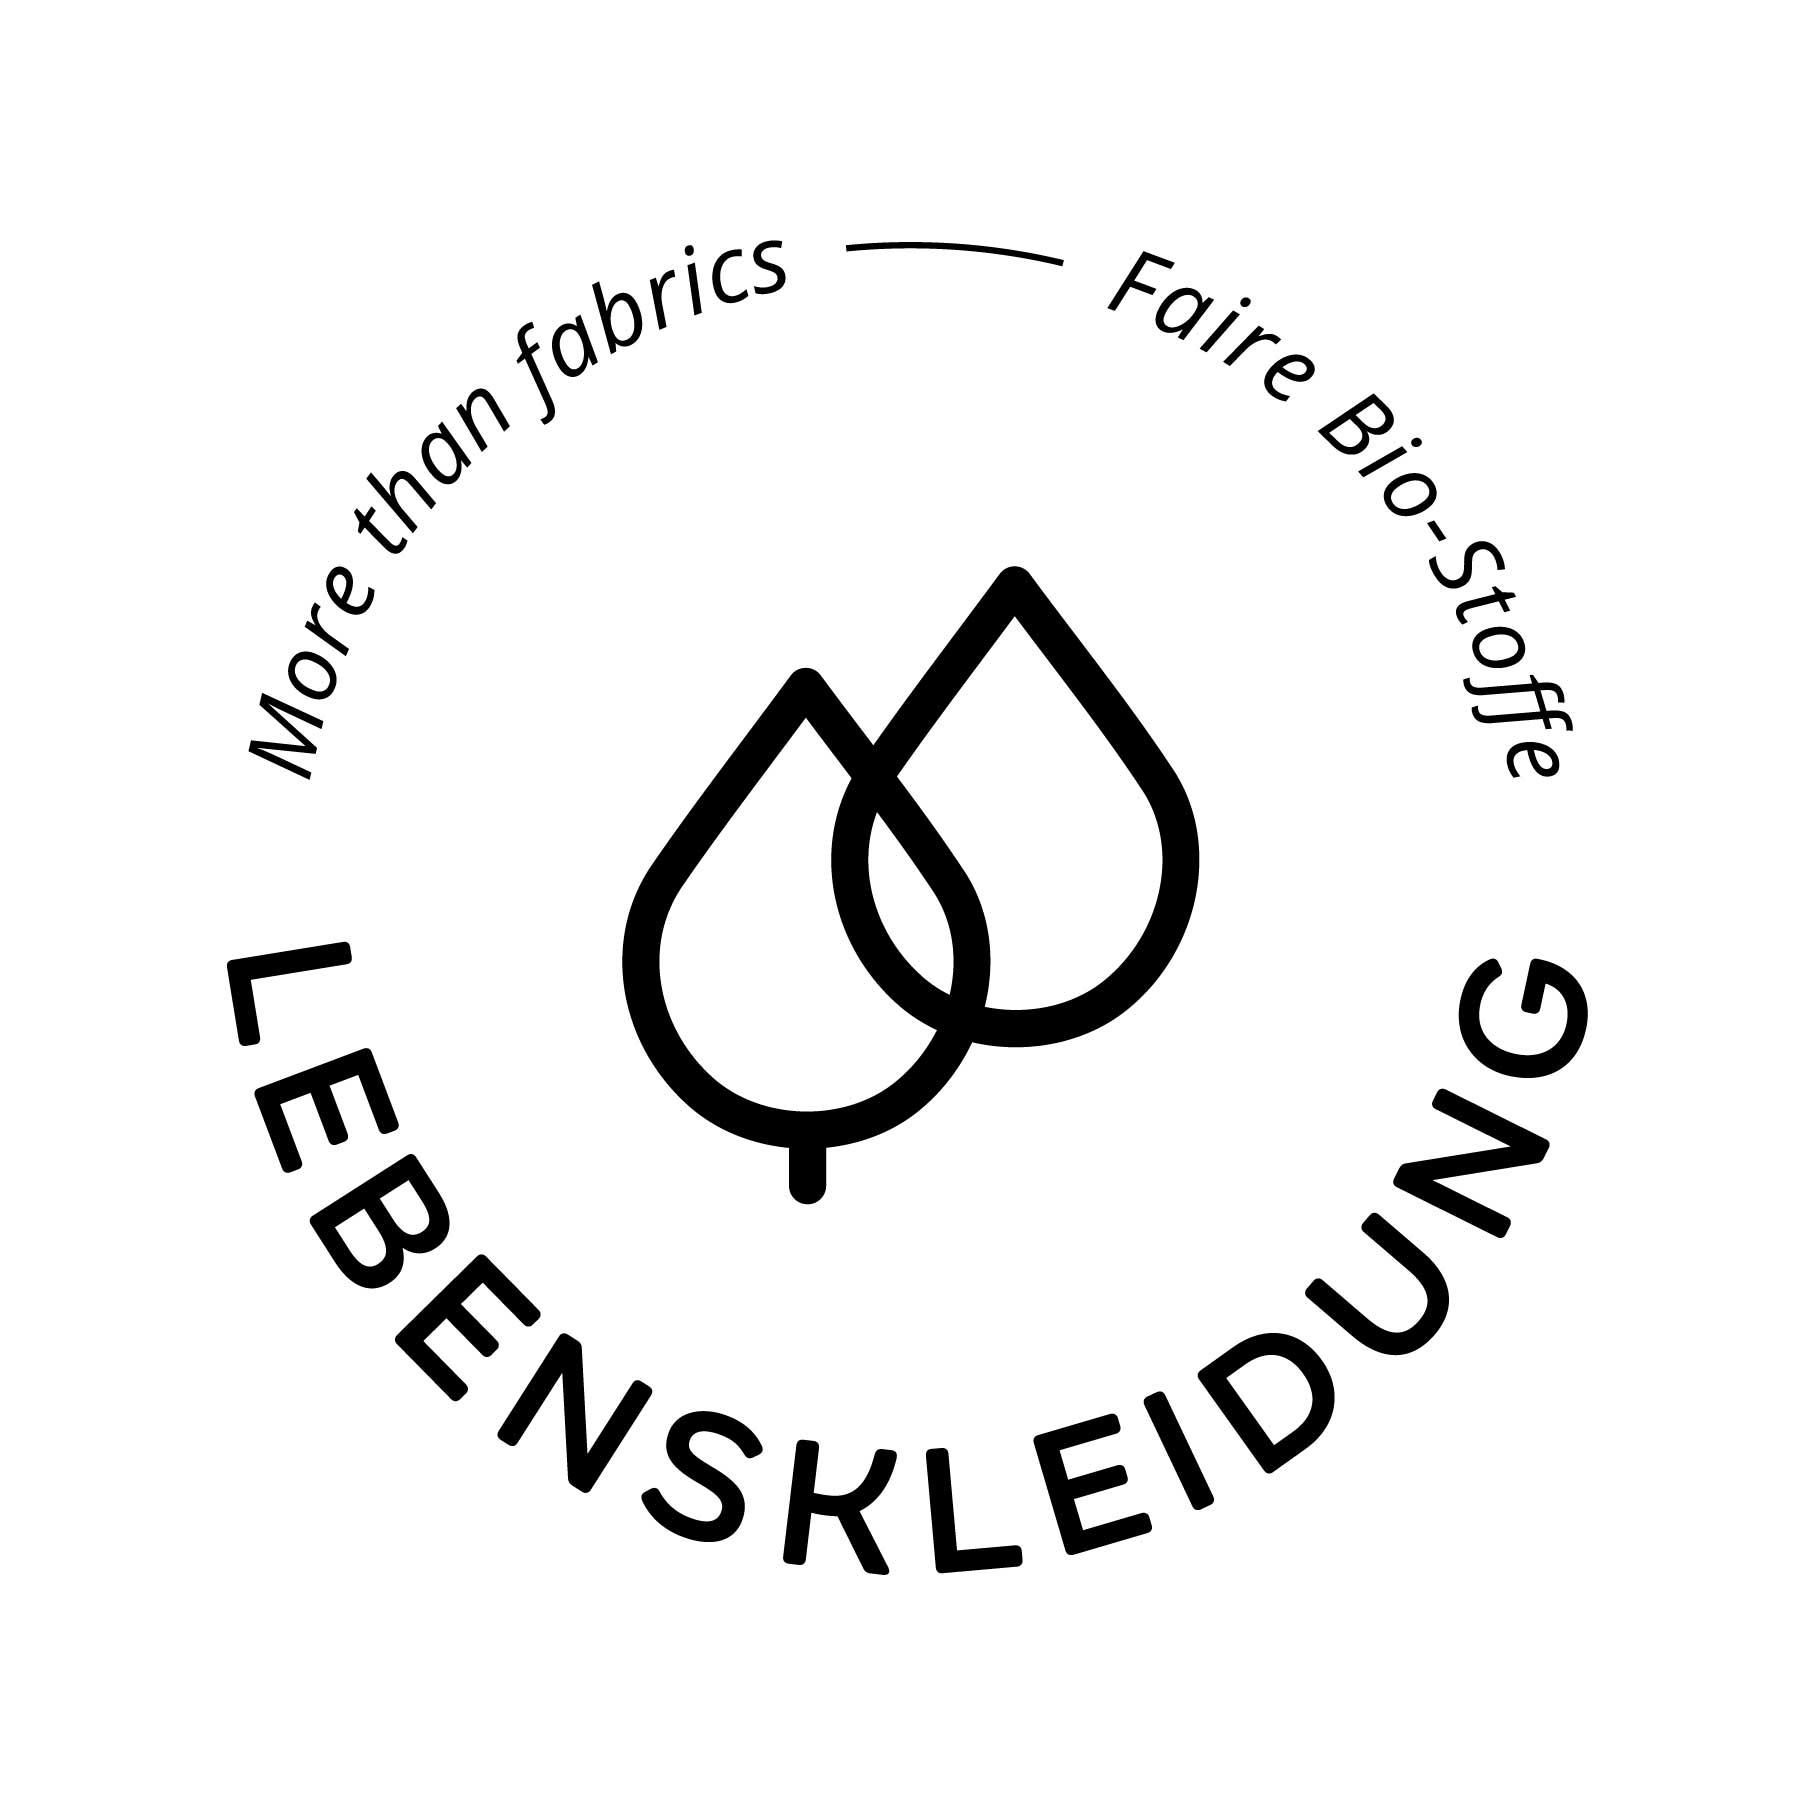 Tela orgánica RIB 2x1 (Puños) Tela - Warm Chocolate